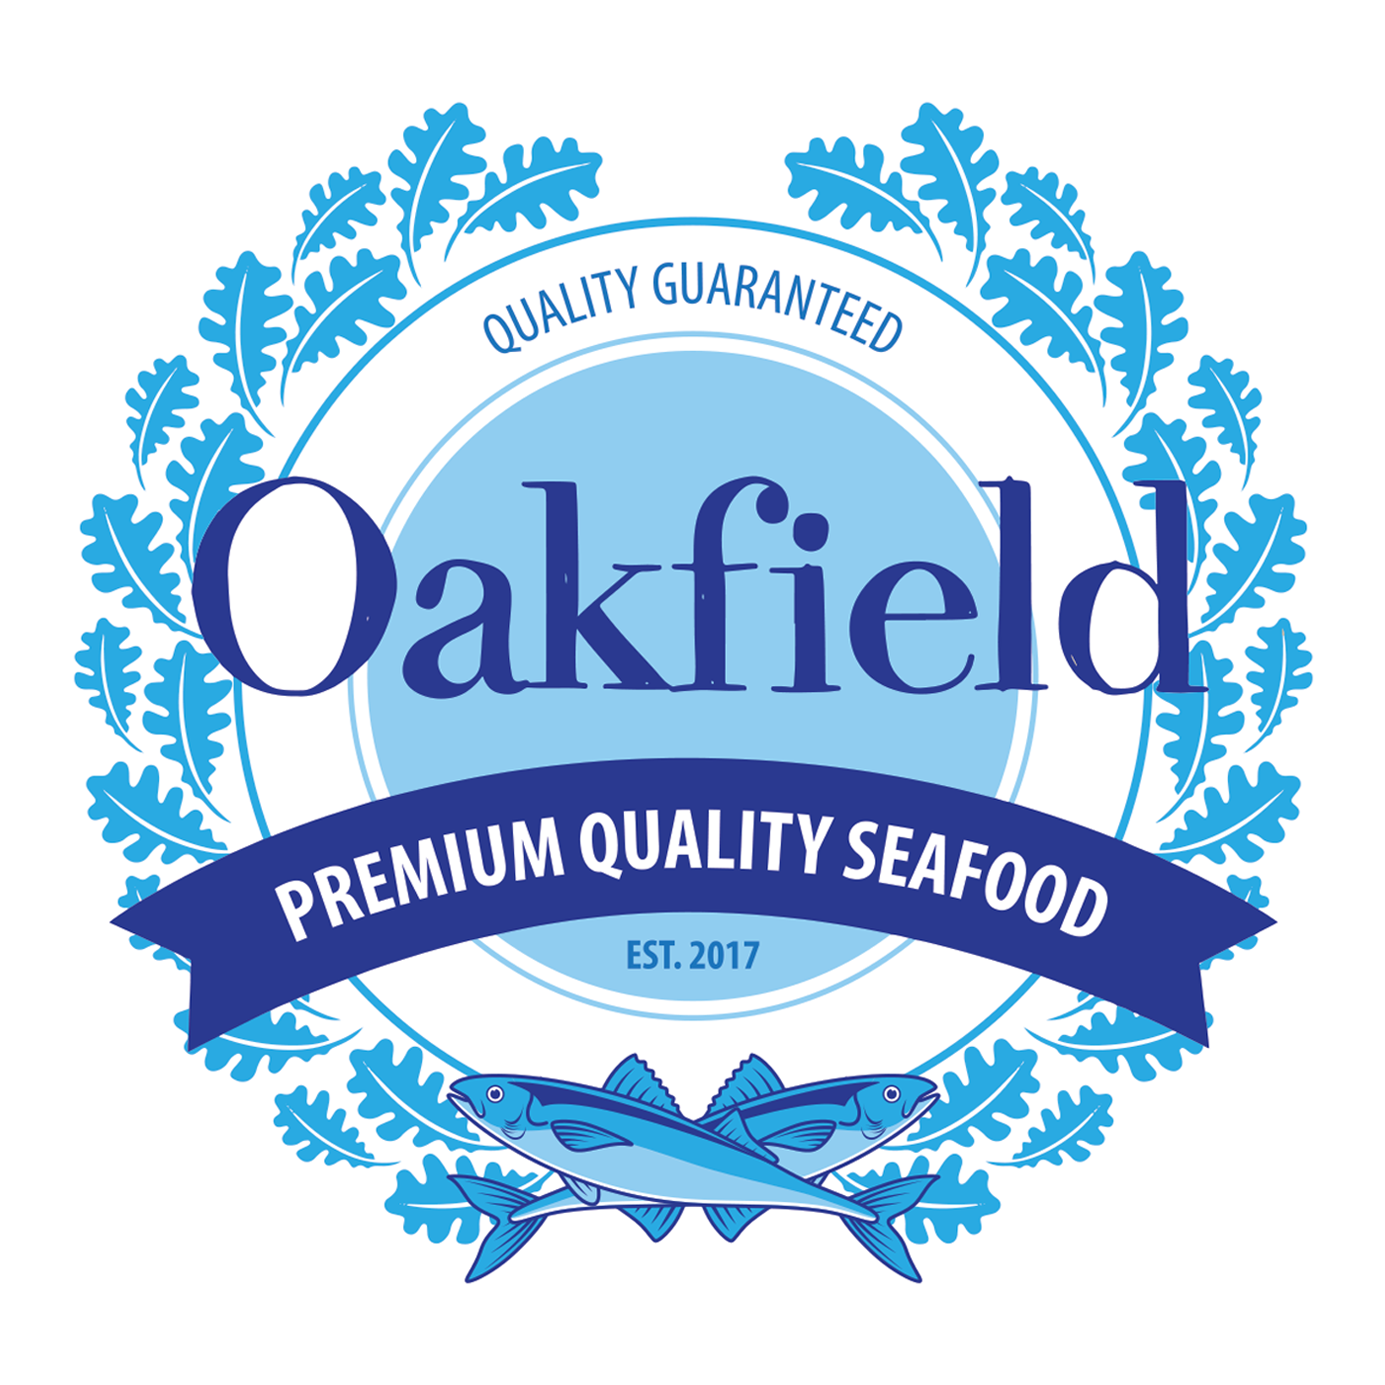 Oakfield Seafood